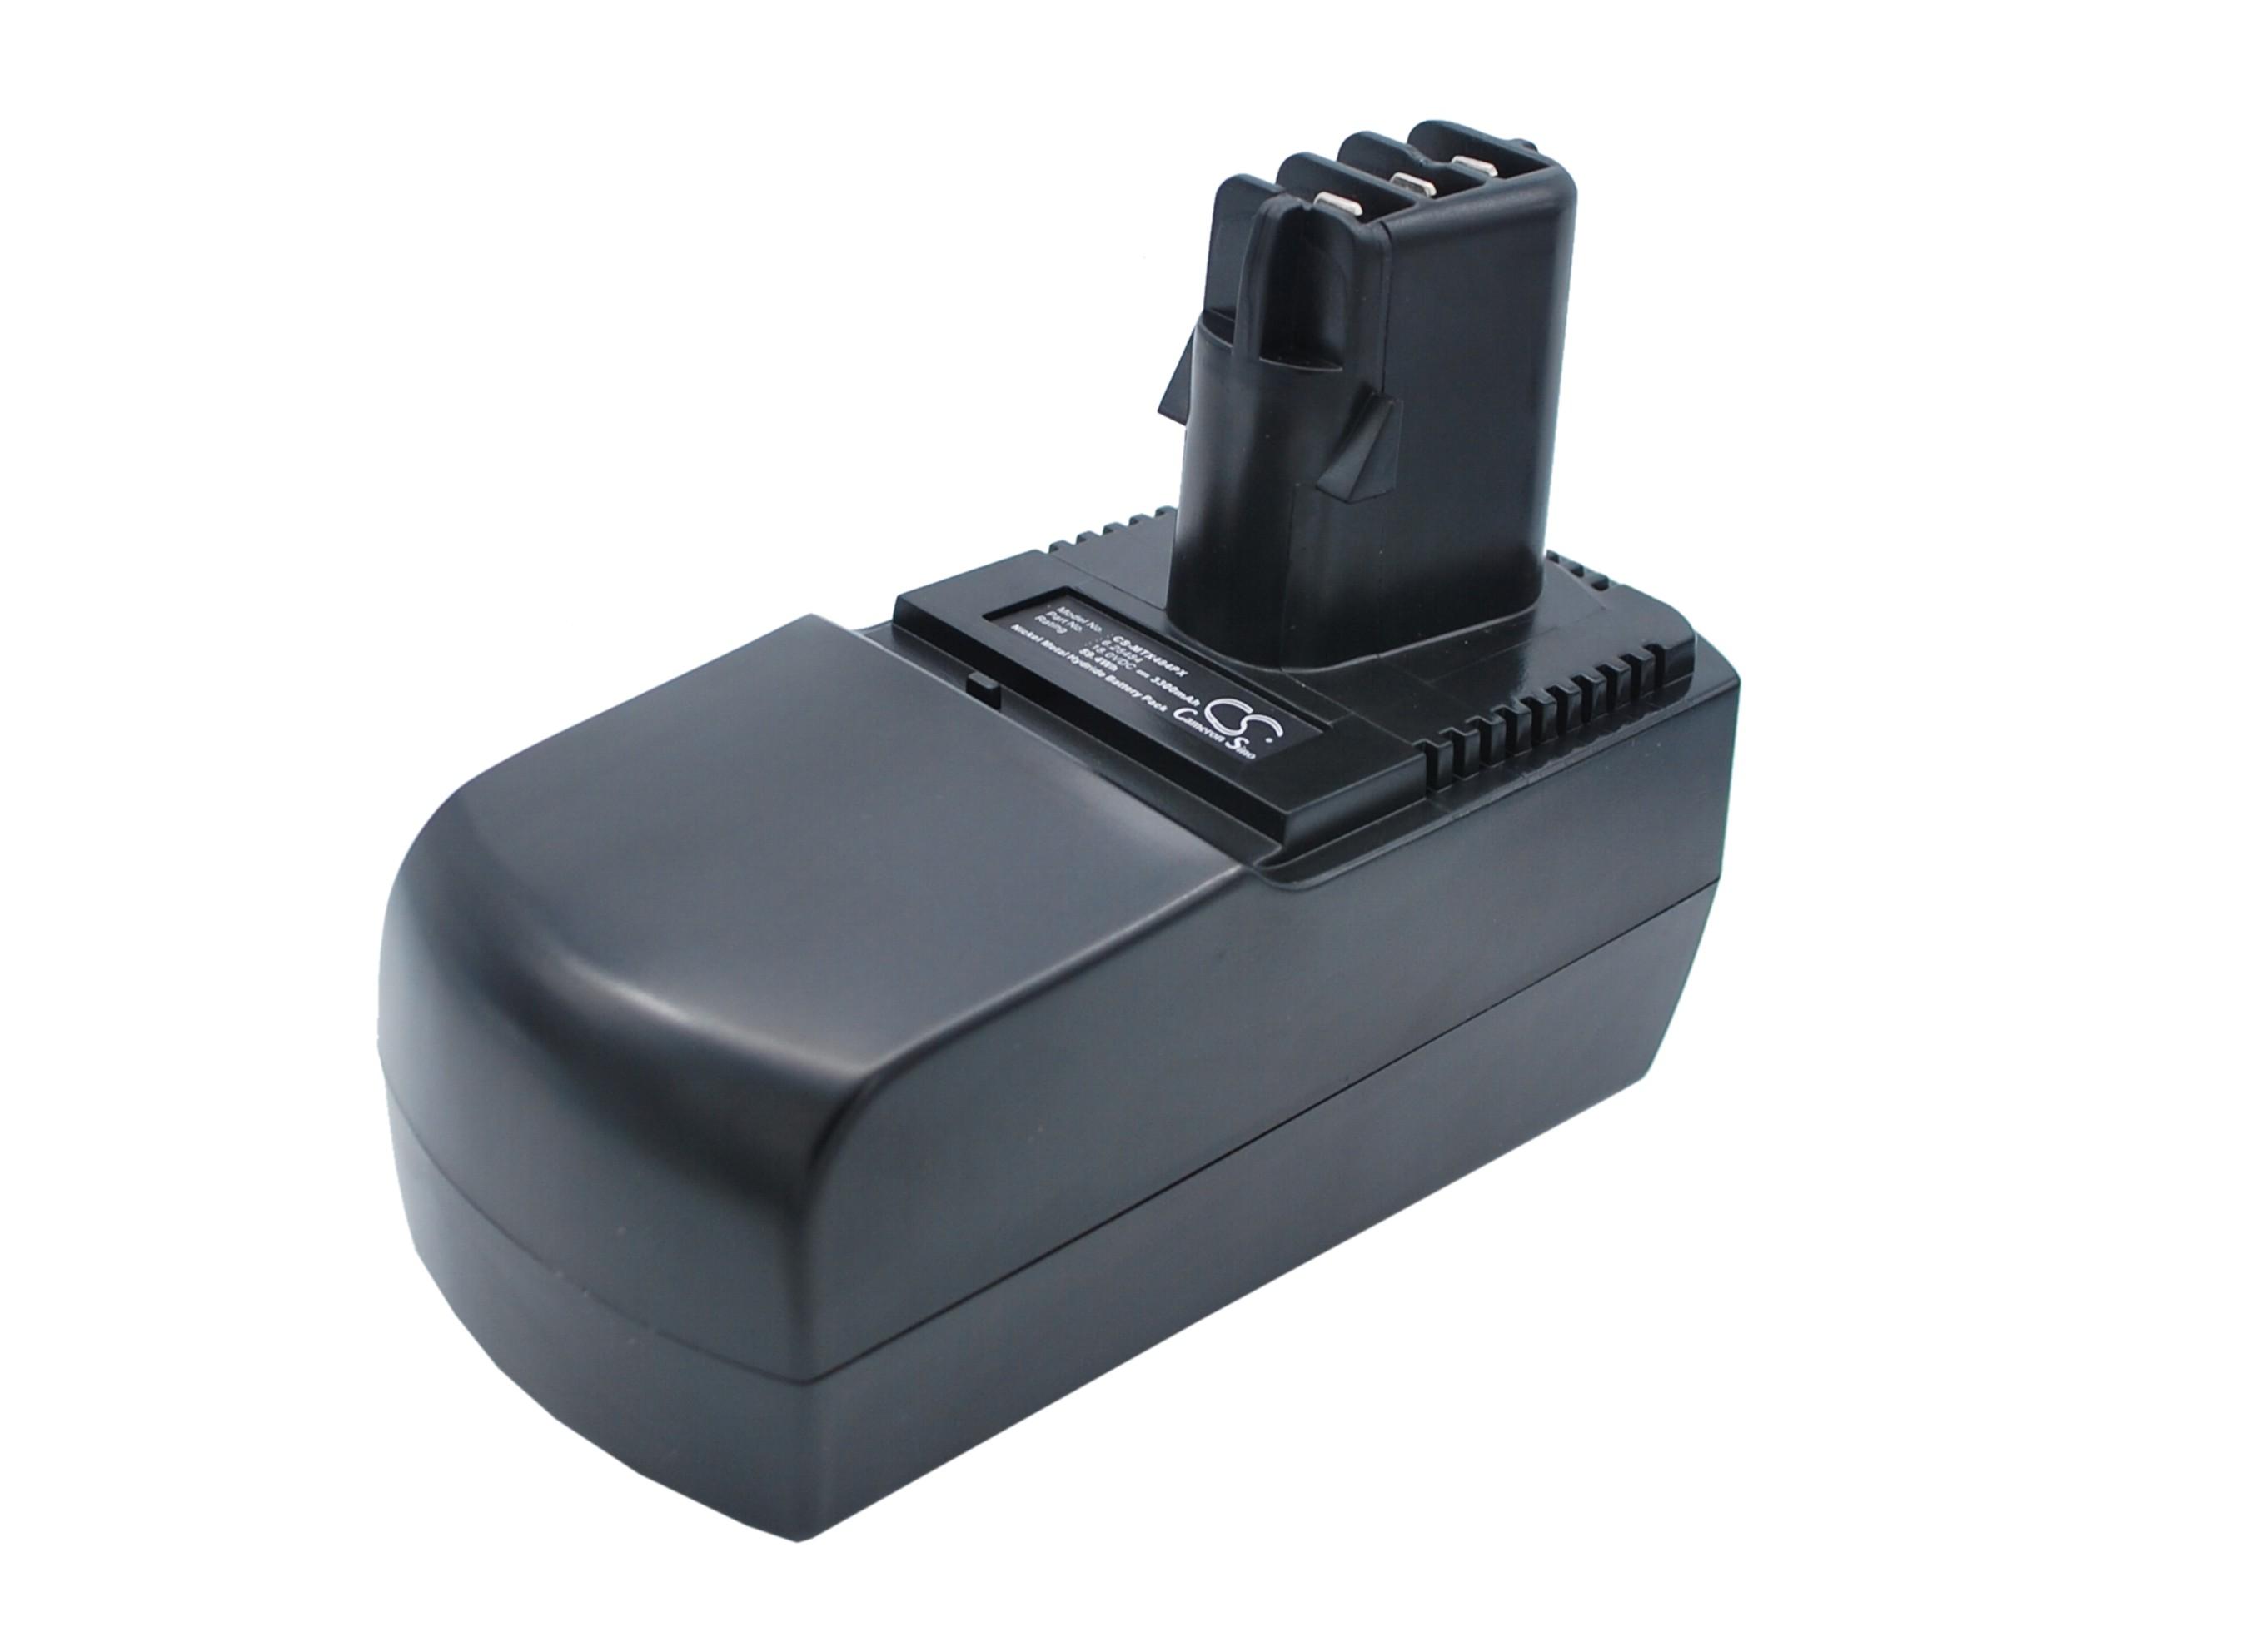 Cameron Sino baterie do nářadí pro METABO BSZ 18 Impuls 18V Ni-MH 3300mAh černá - neoriginální